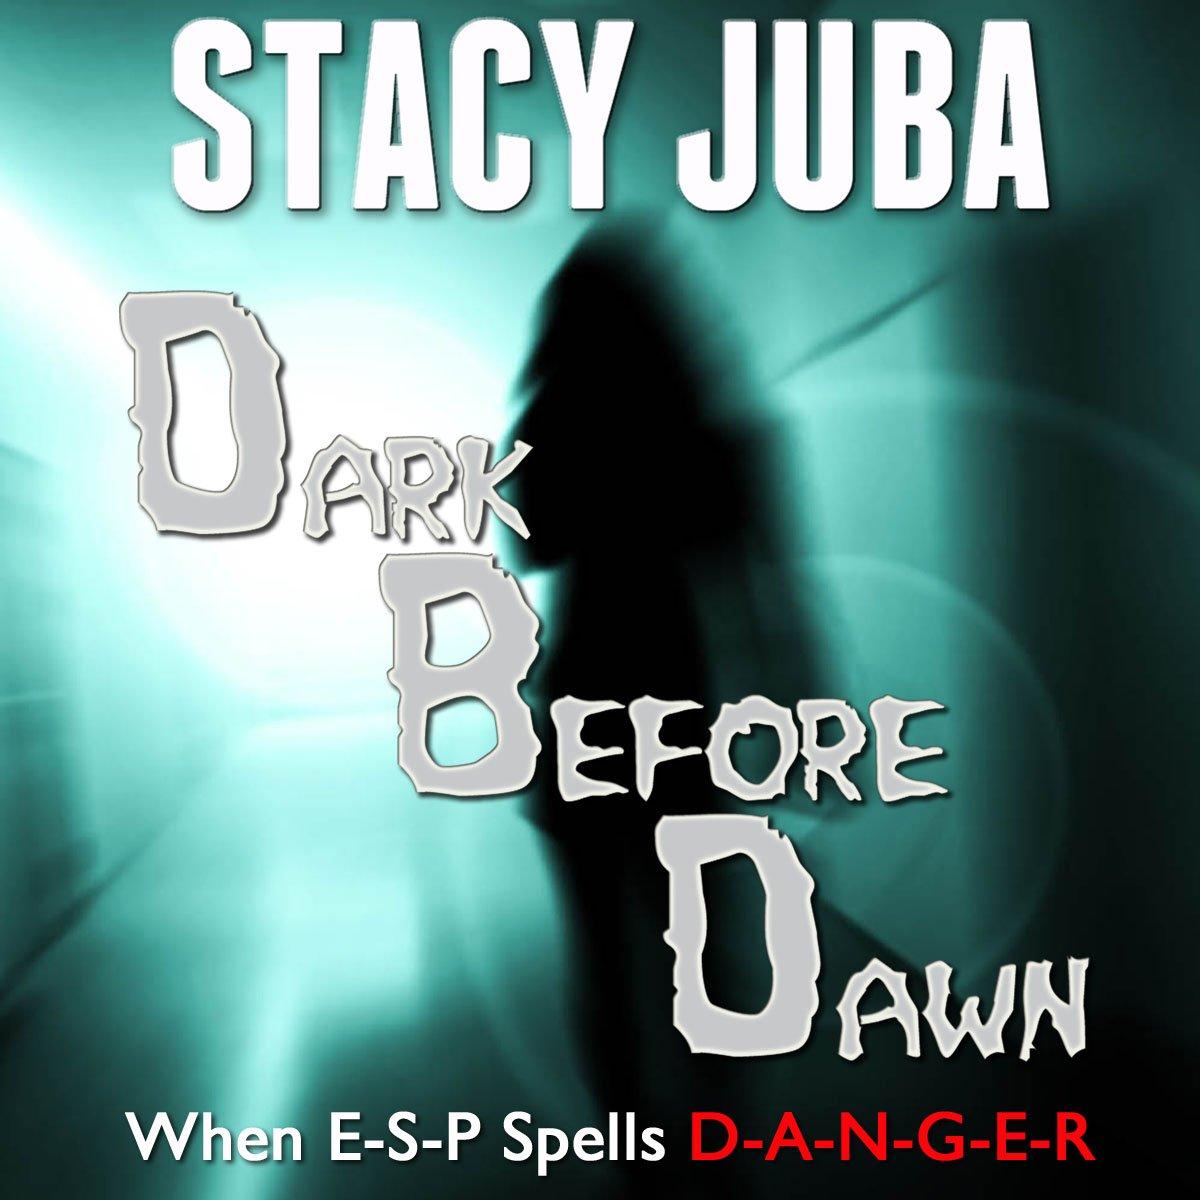 dark before dawn audio book 1200x1200